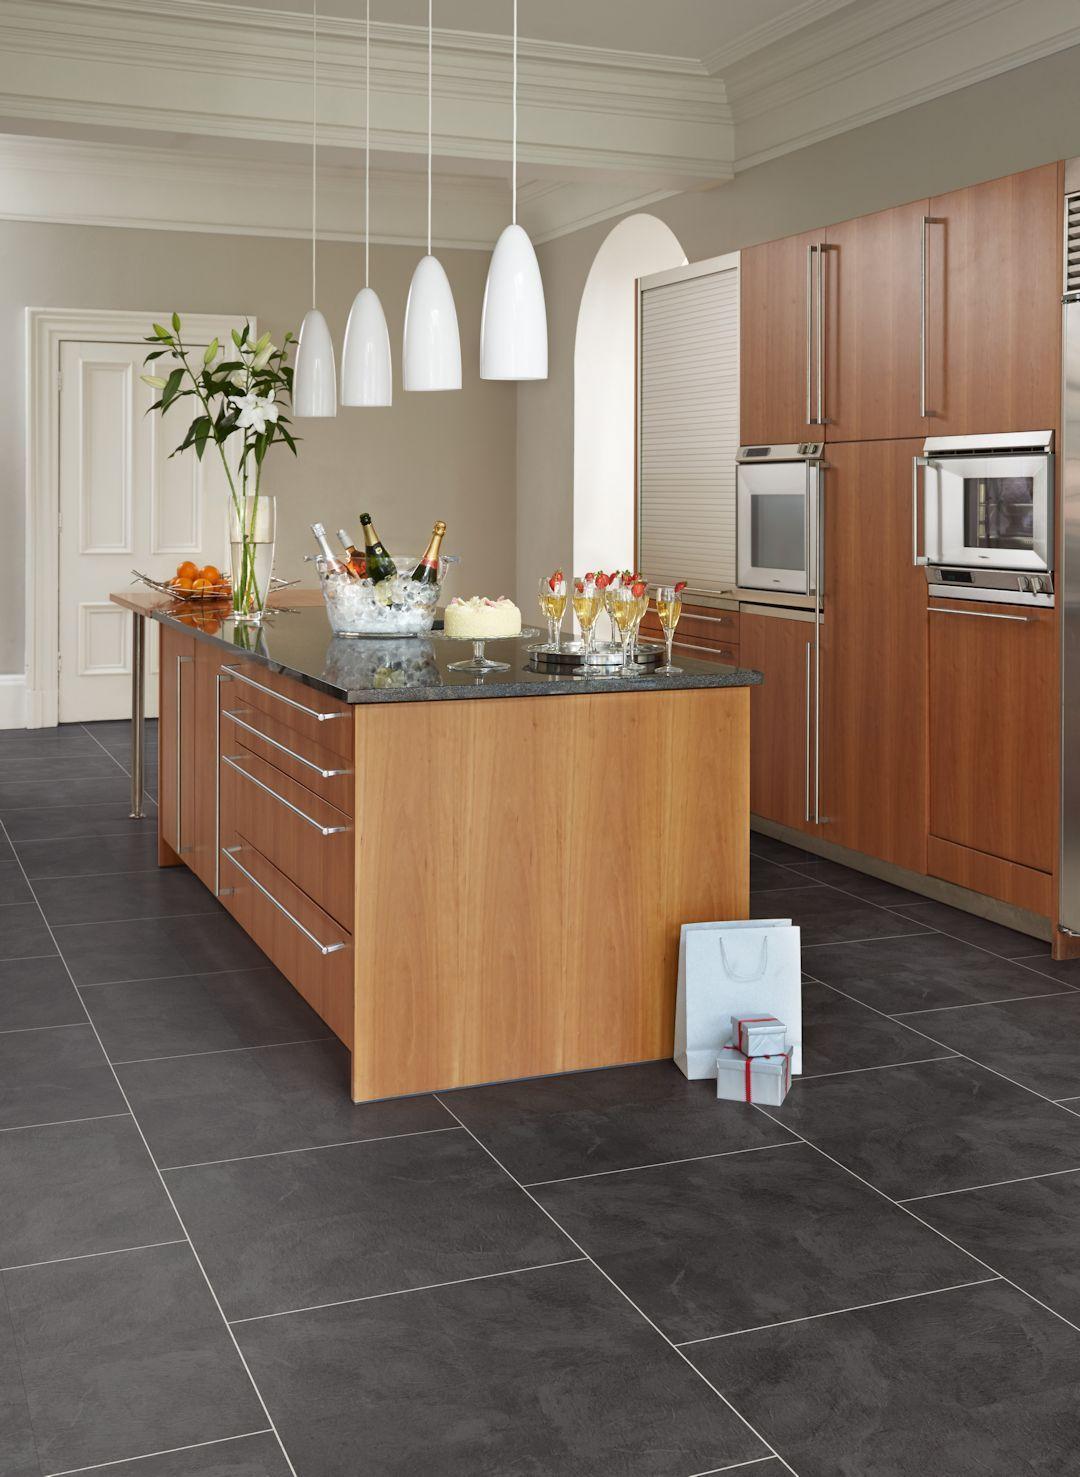 Kitchen Vinyl Ikea Counters Atlantic Slate Camaro Luxury Tile Flooring In Brickwork Layout Featured